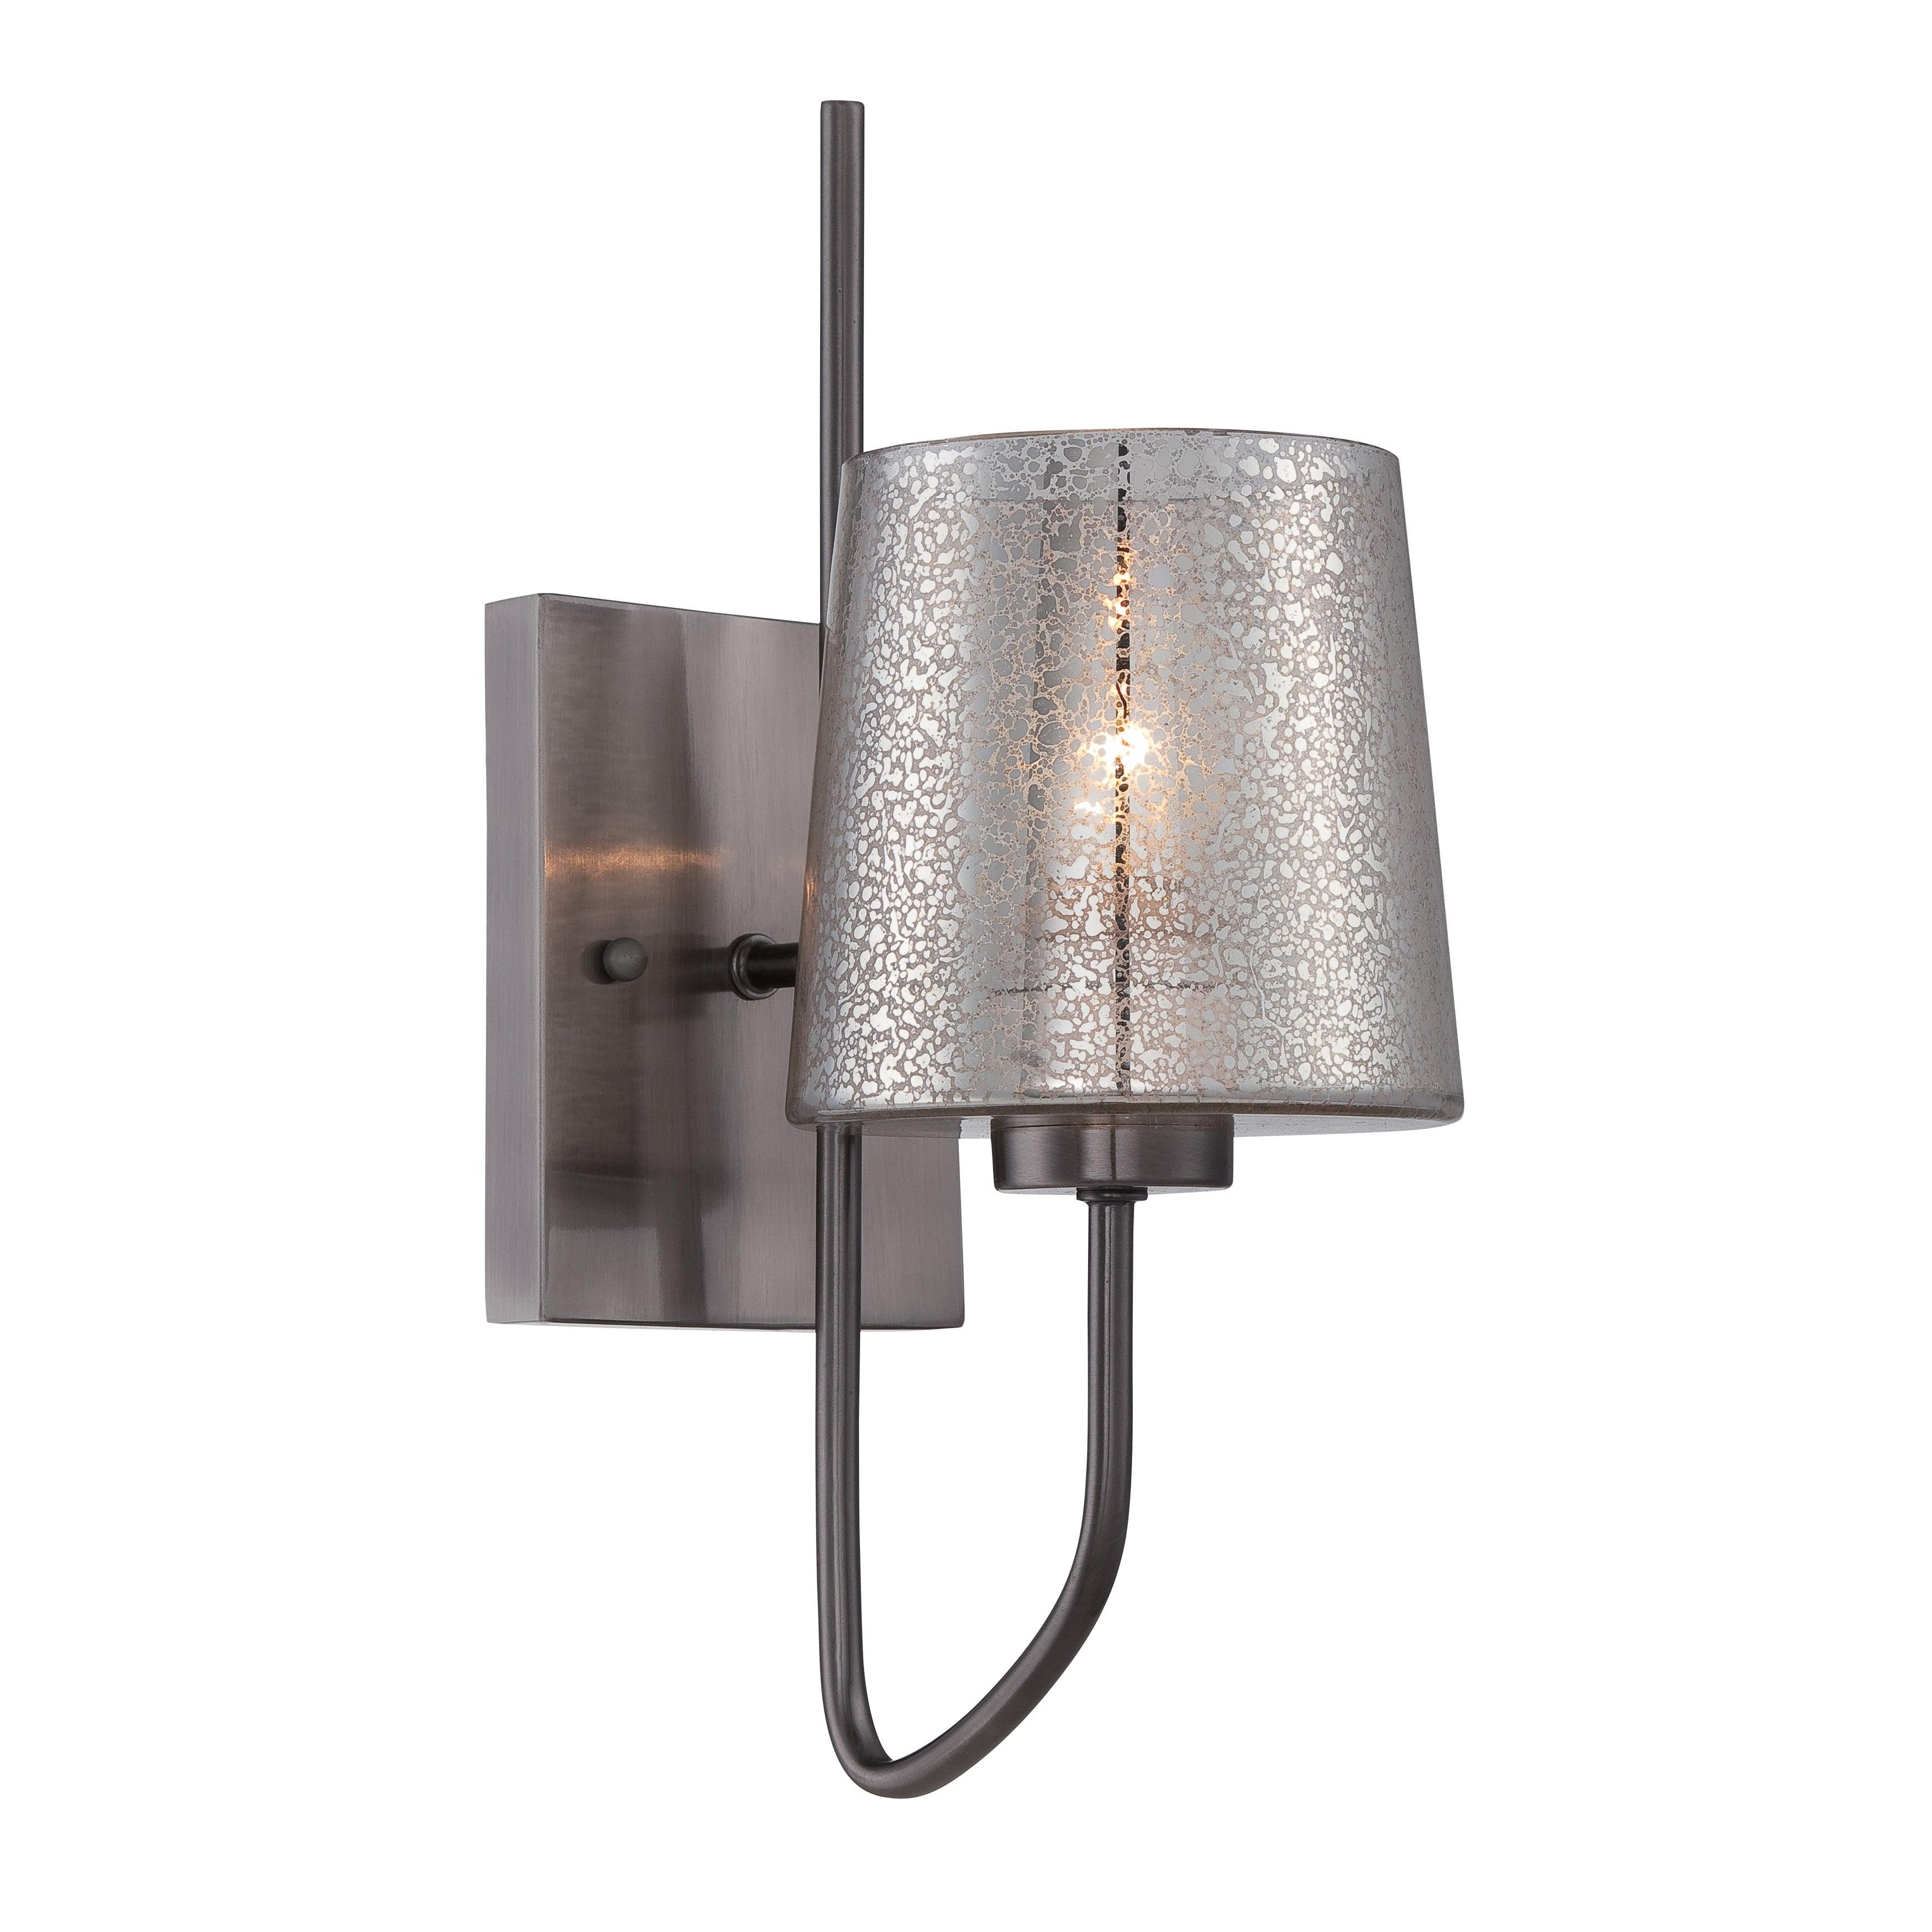 Varaluz Meridian 1-light Black Chrome Wall Sconce (Black chrome and Mercury glass)